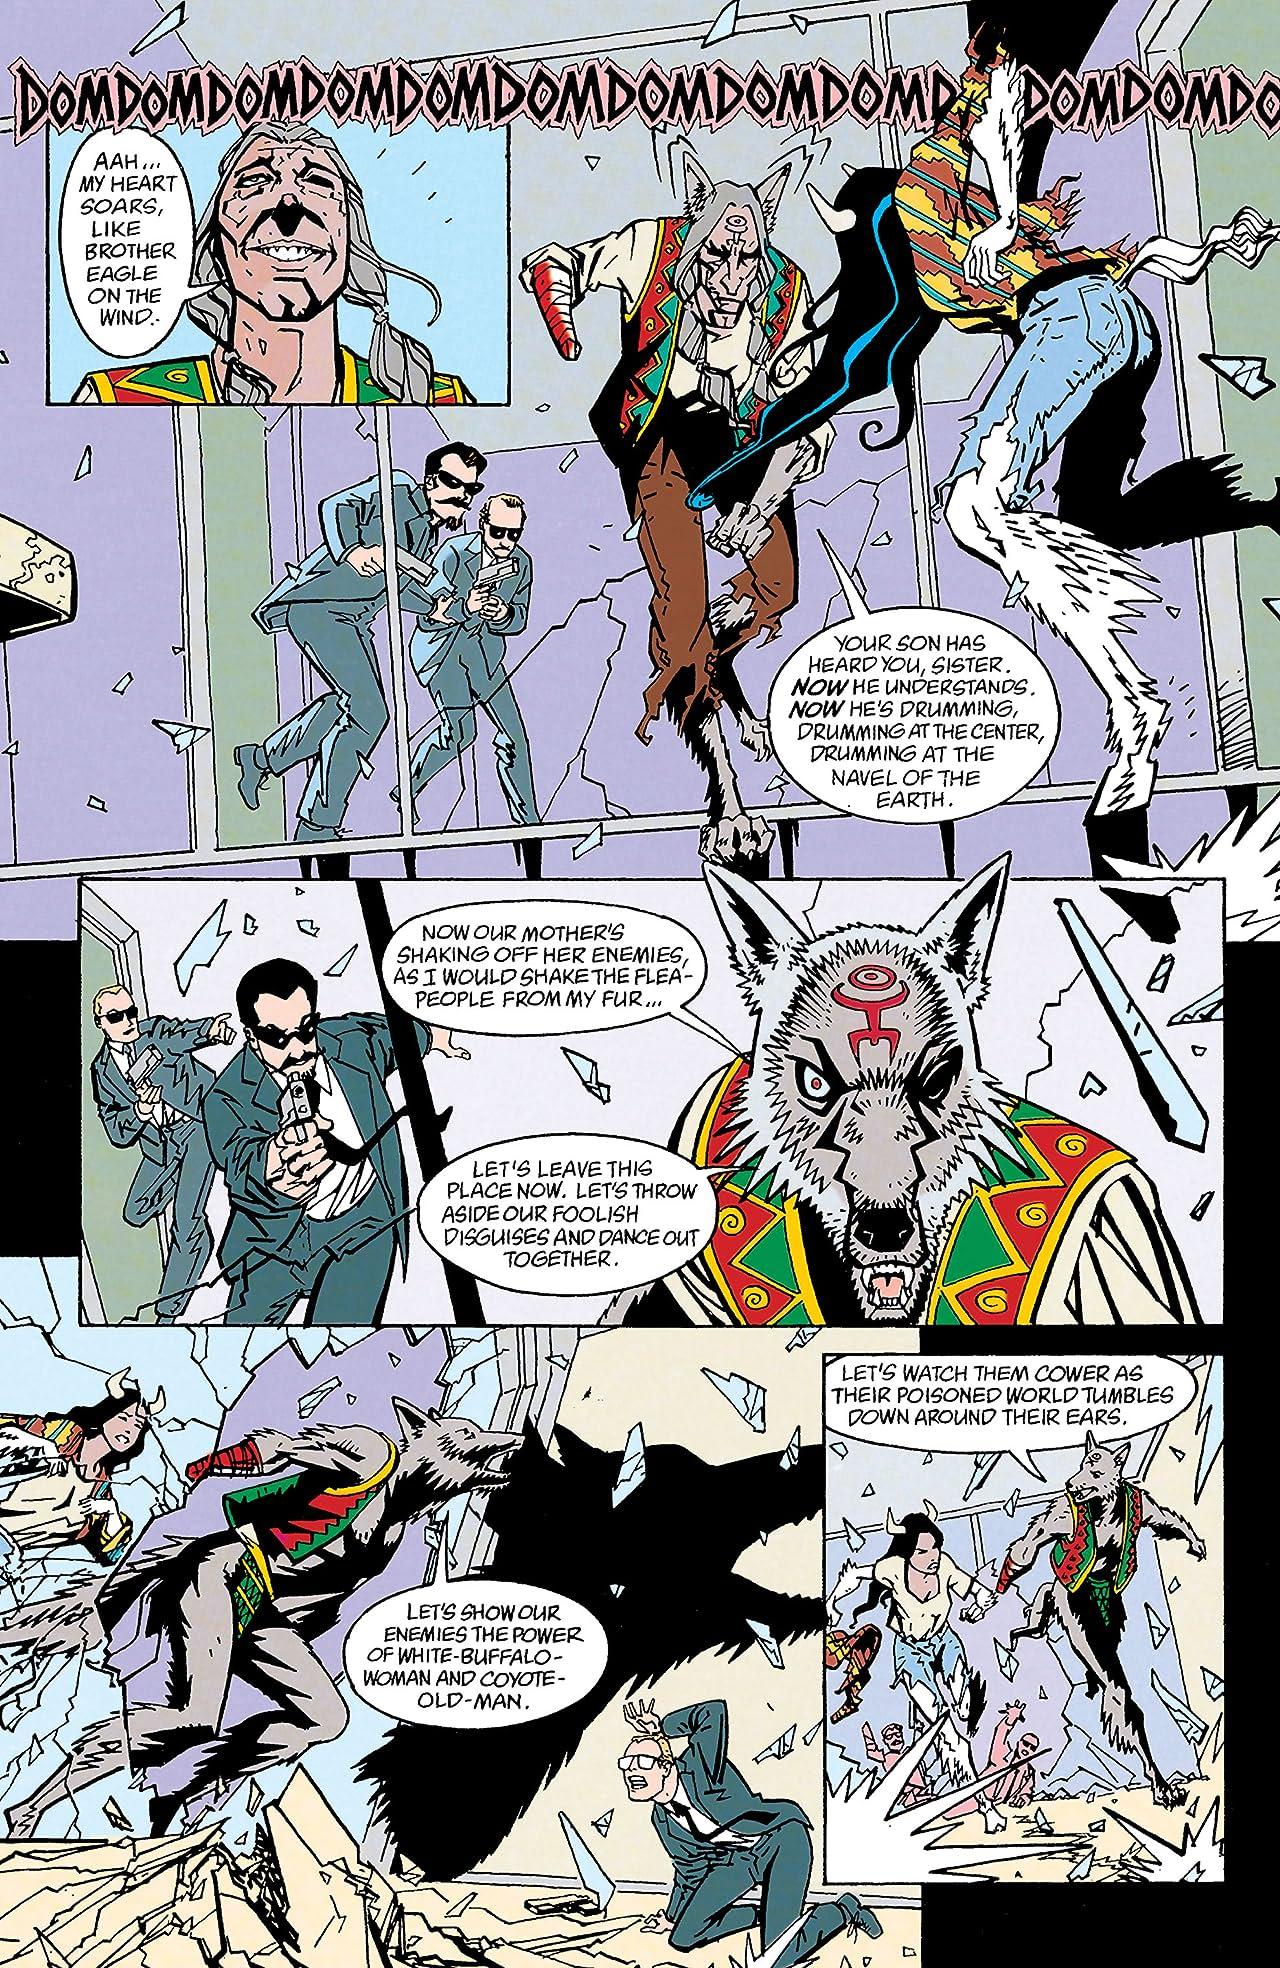 Ghostdancing (1995) #6